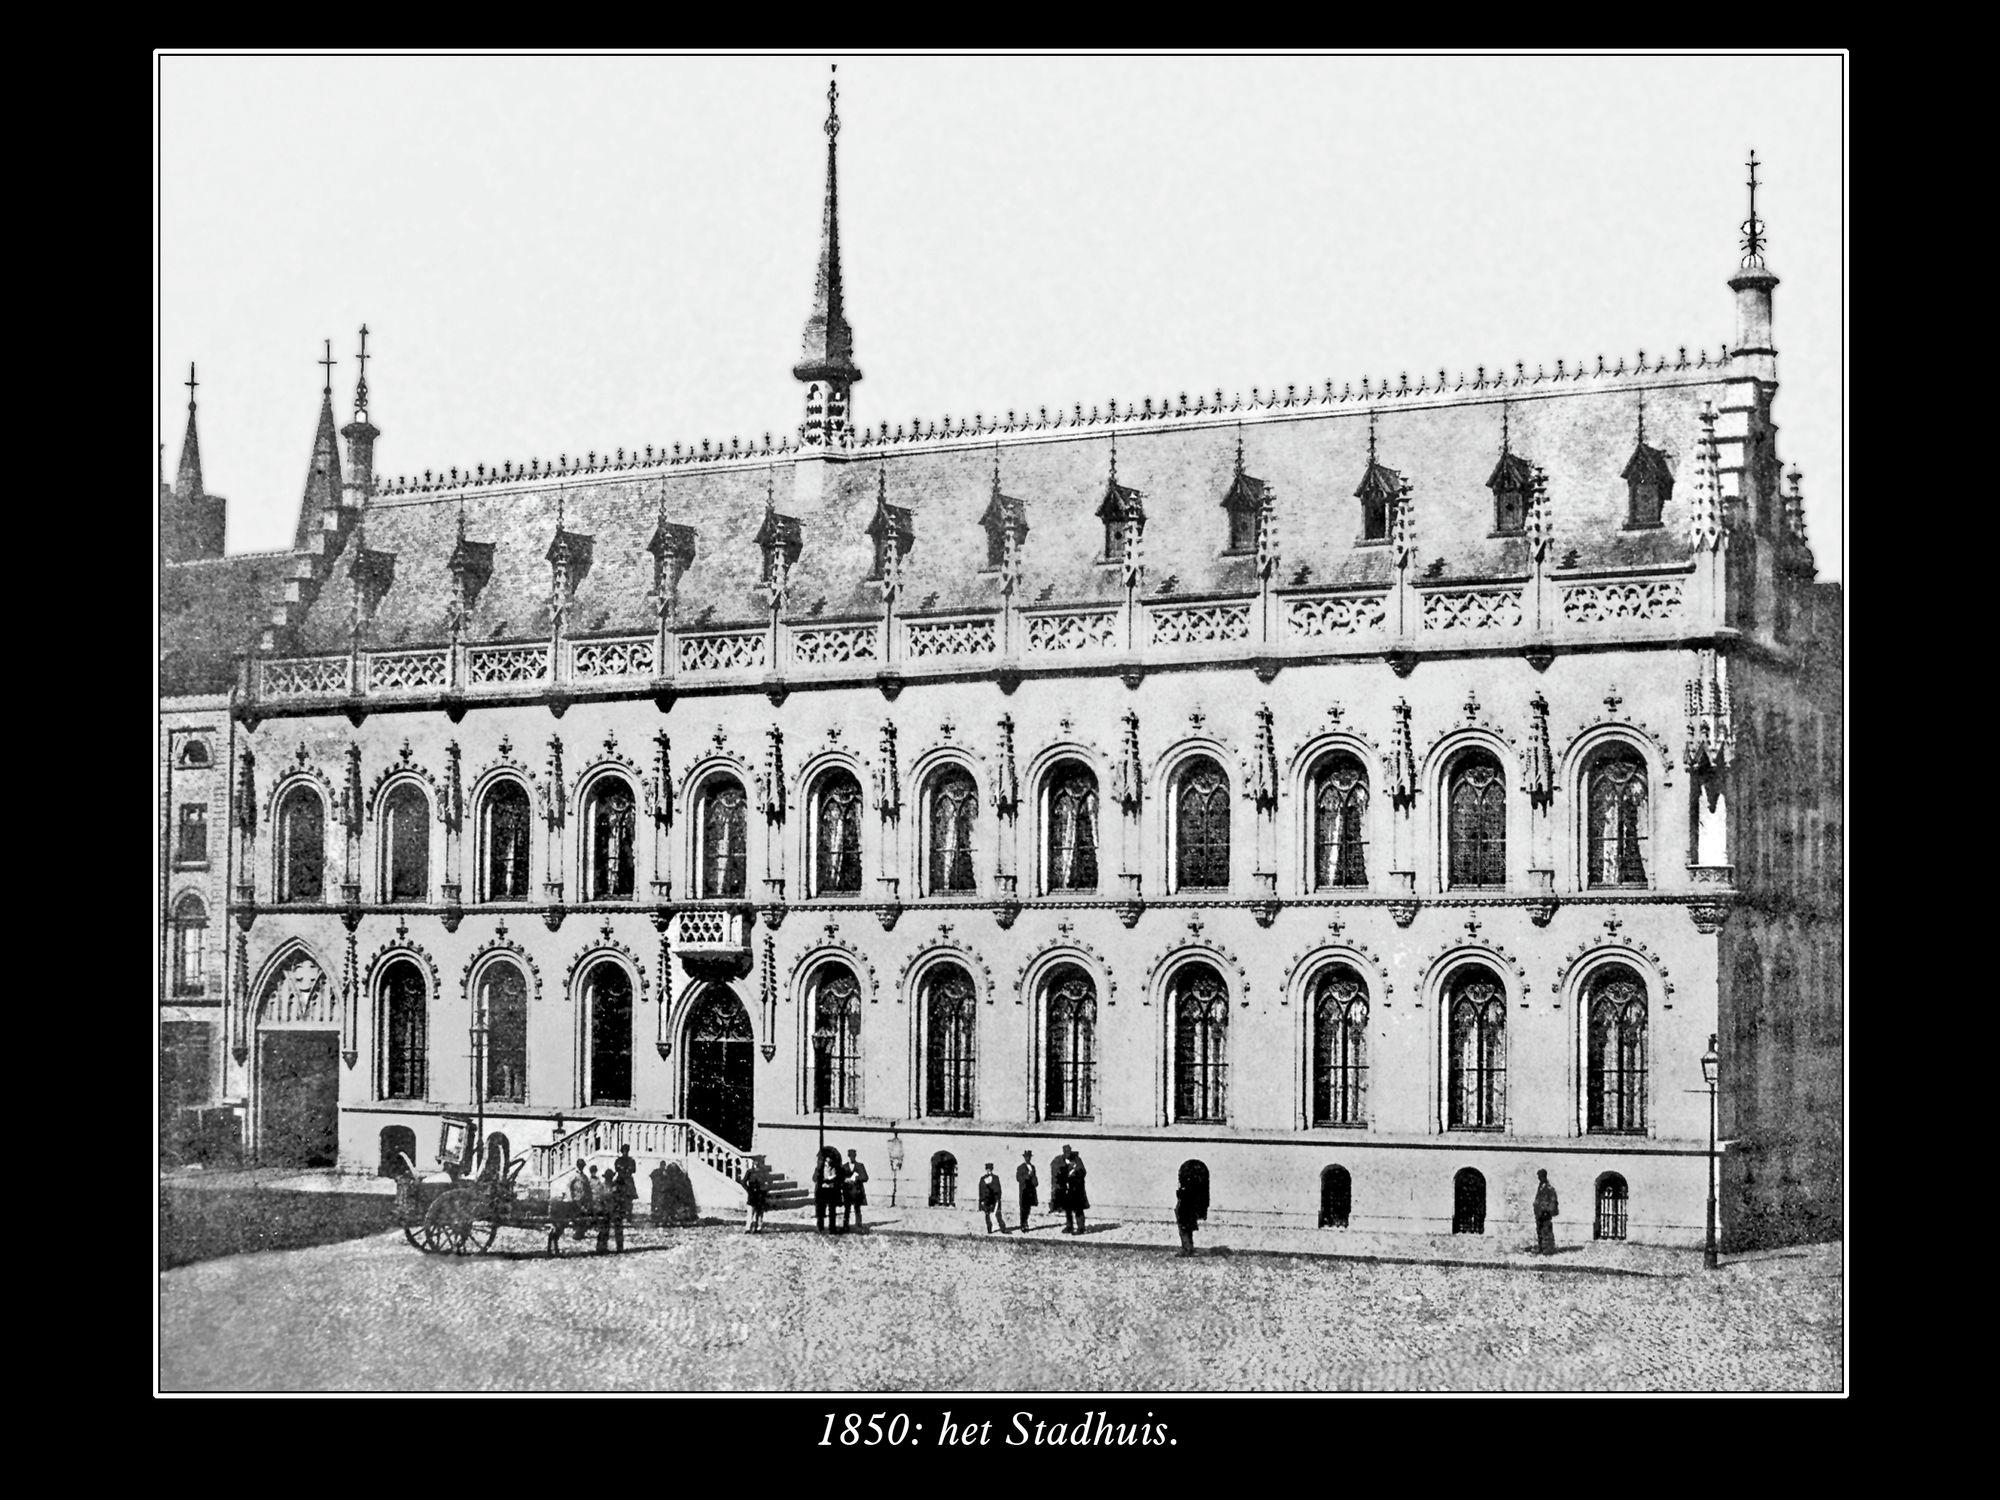 Het stadhuis anno1850